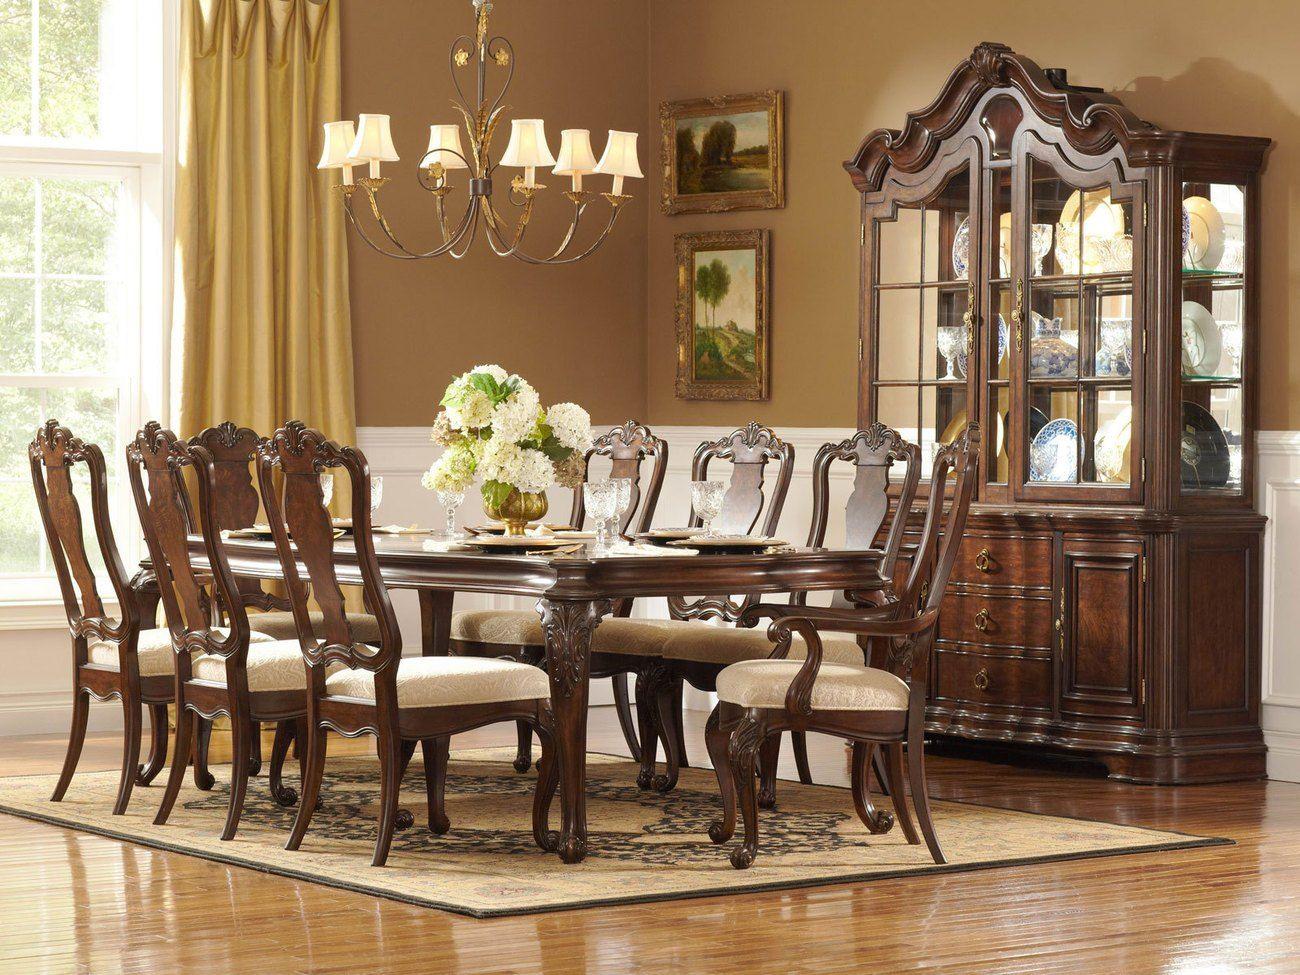 Dark Wood Dining Room Furniture Traditional Dining Room Sets